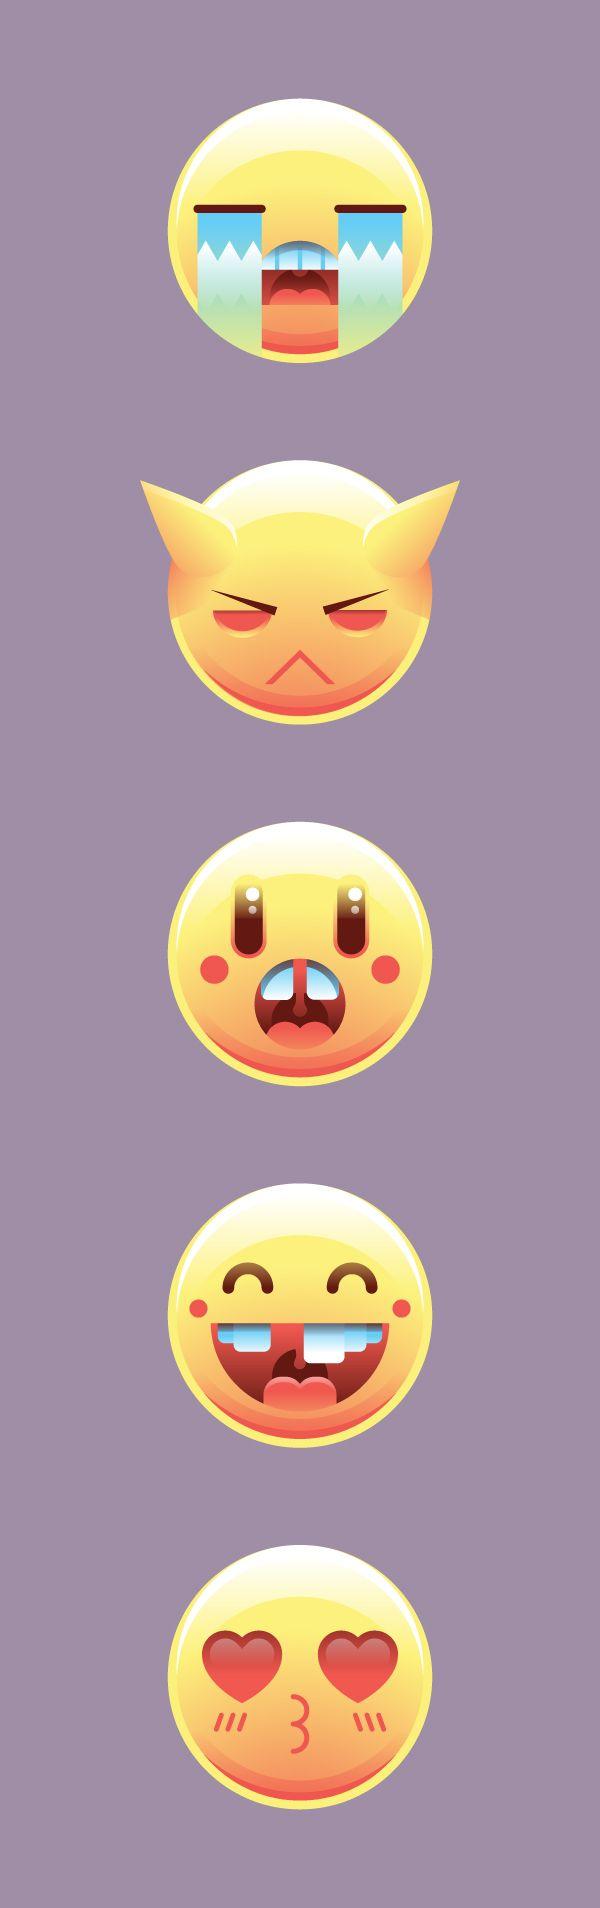 How to Draw a Set of Emoticons in Adobe Illustrator - Tuts+ Design & Illustration Tutorial